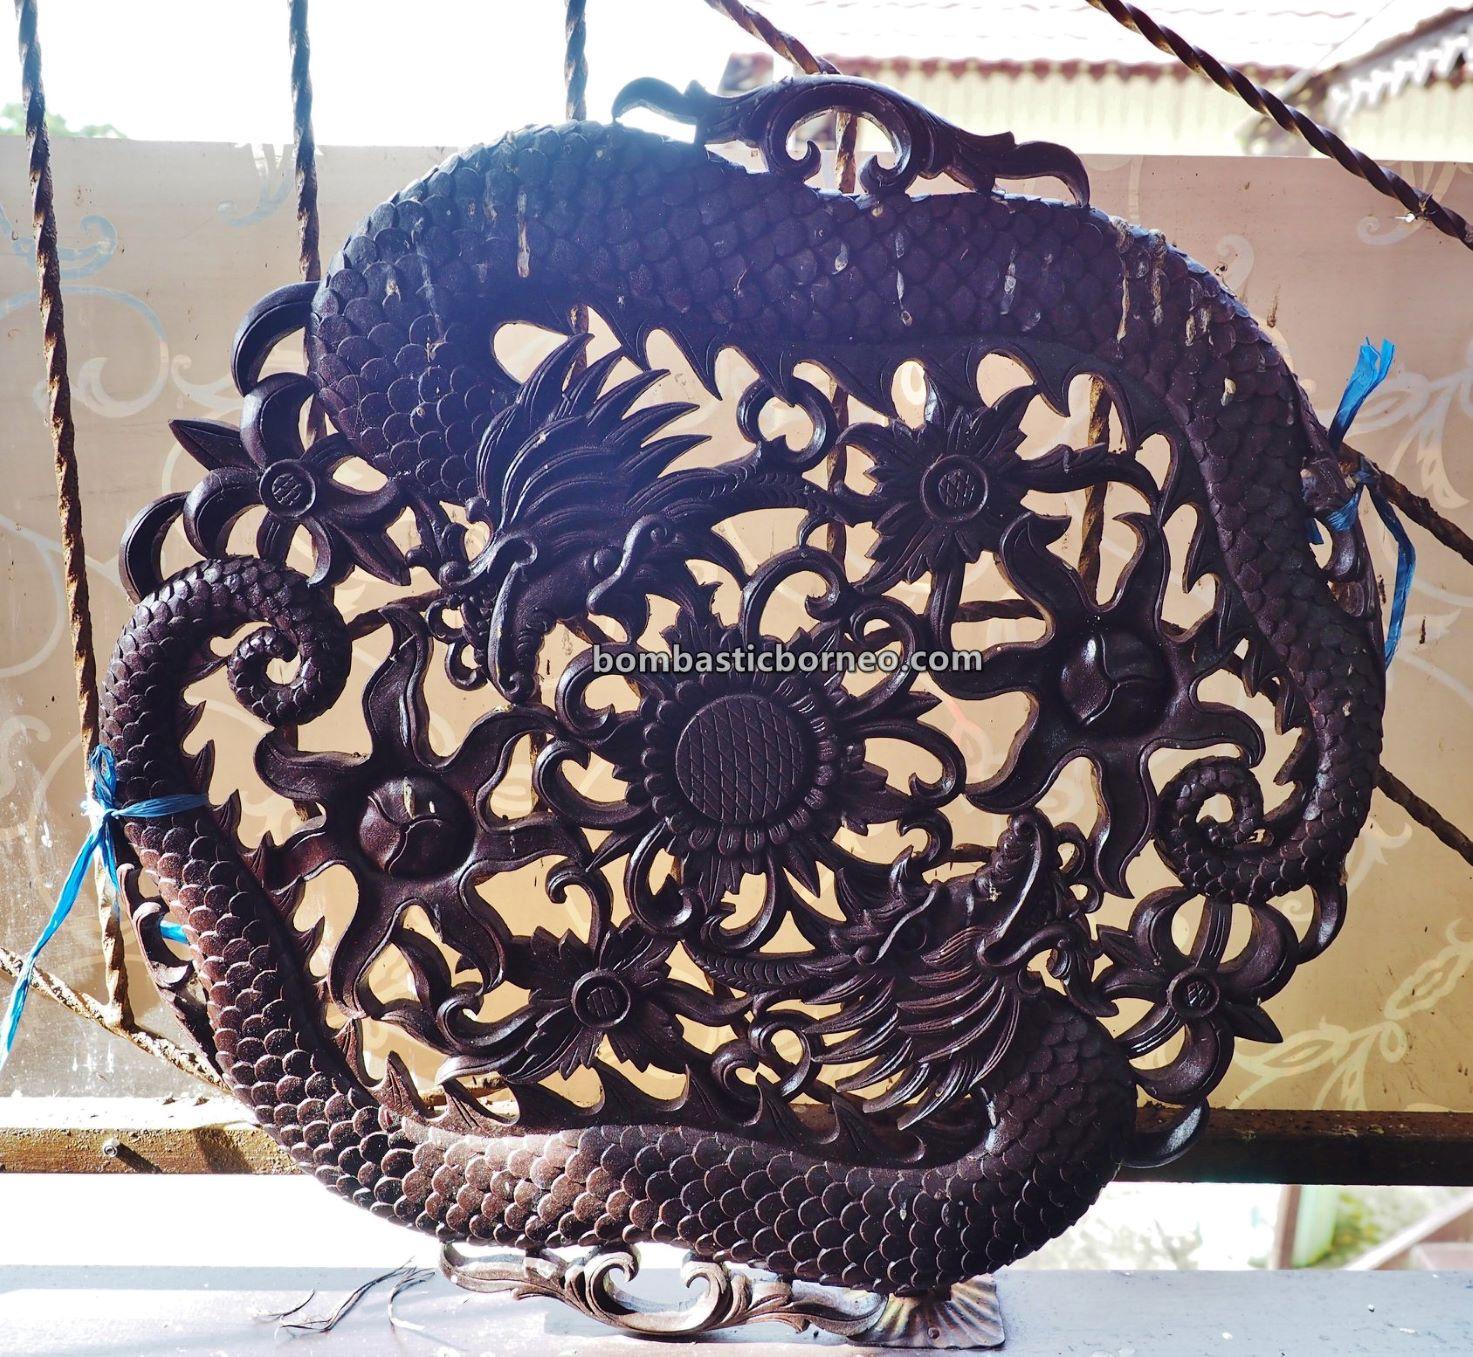 Rumah Baloy Mayo, Dayak House, Heritage, authentic, traditional, native, tribe, destination, Indonesia, Kalimantan Utara, Pariwisata, travel guide, 婆罗洲原住民文化, 印尼北加里曼丹, 打拉根土著部落